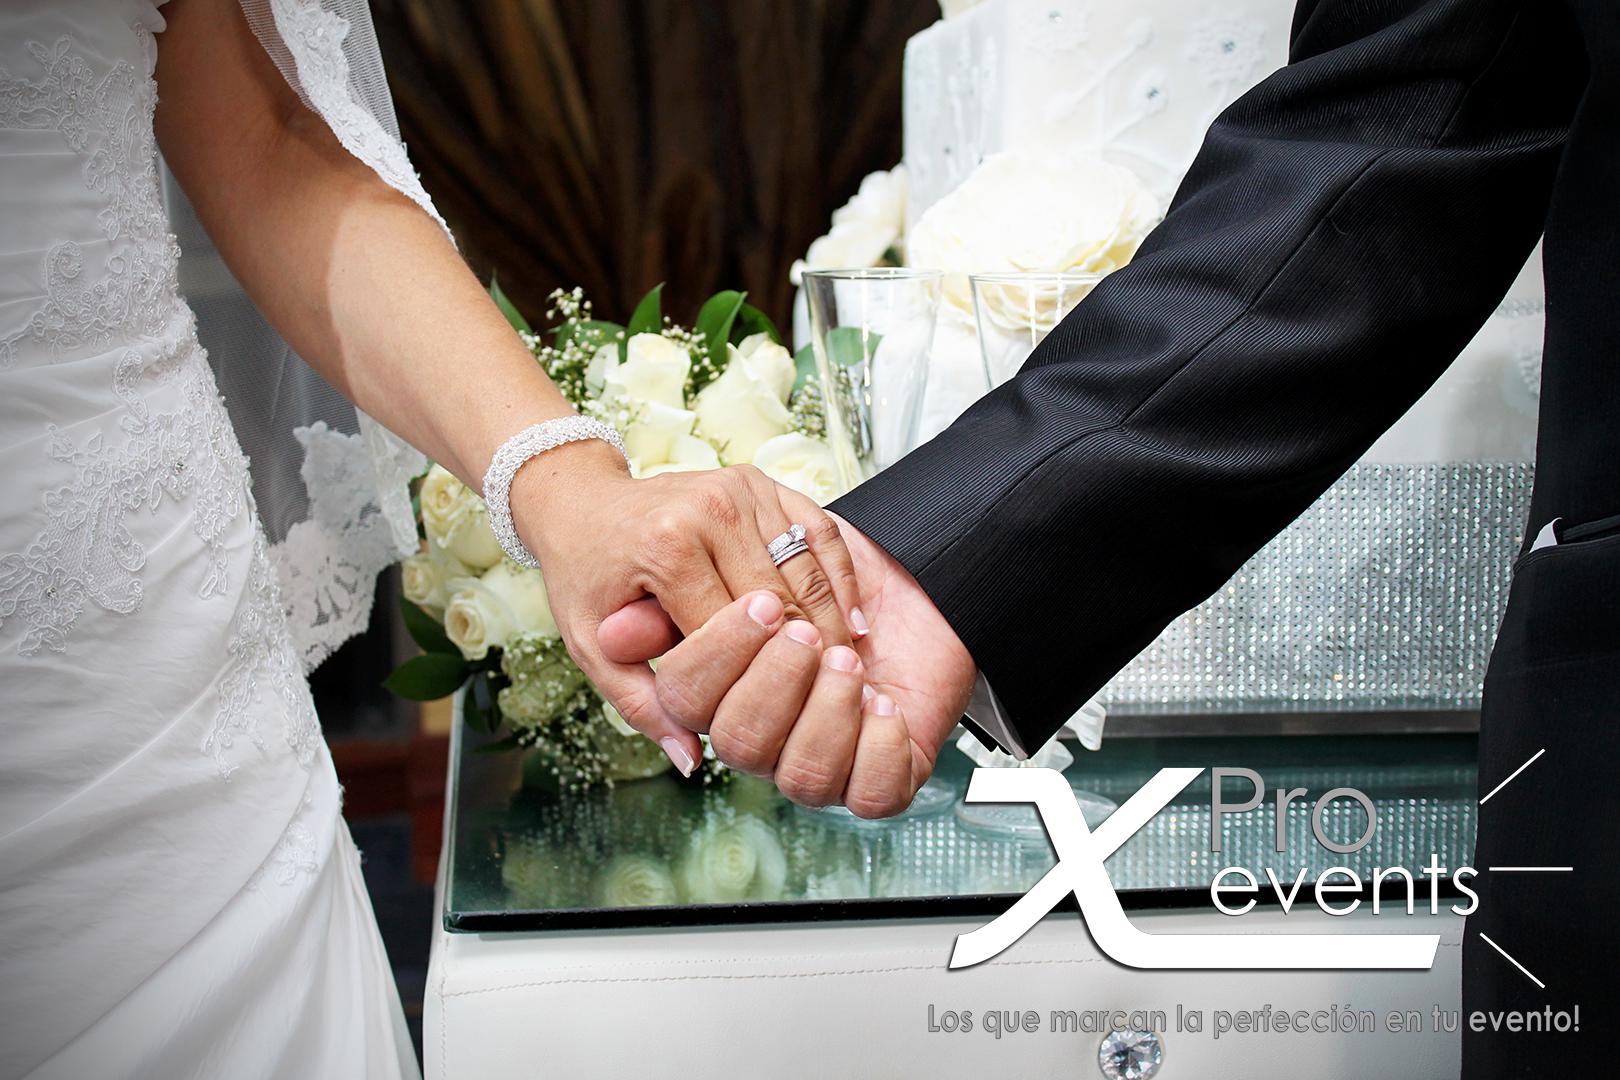 www.Xproevents.com - Manos de los novios.png